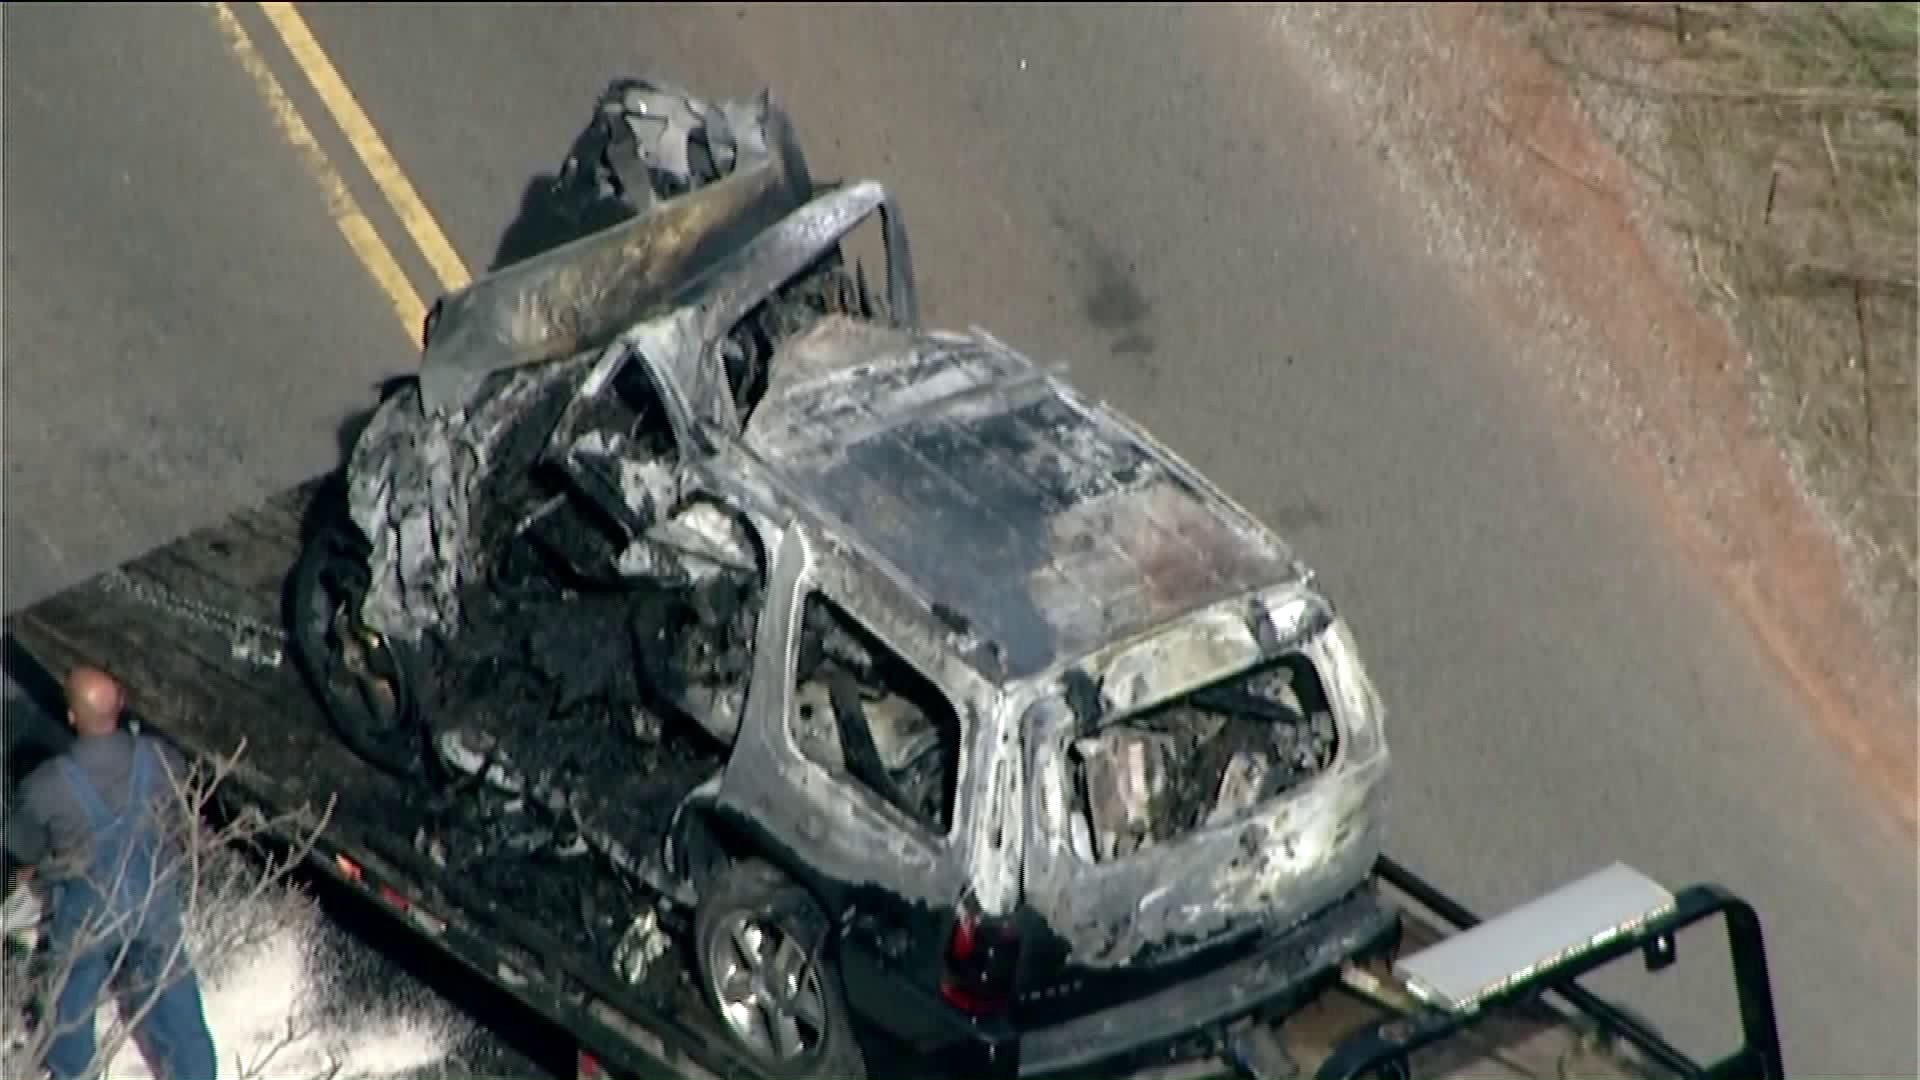 Aubrey McClendon's Chevy Tahoe caught fire after running into an overpass embankment.